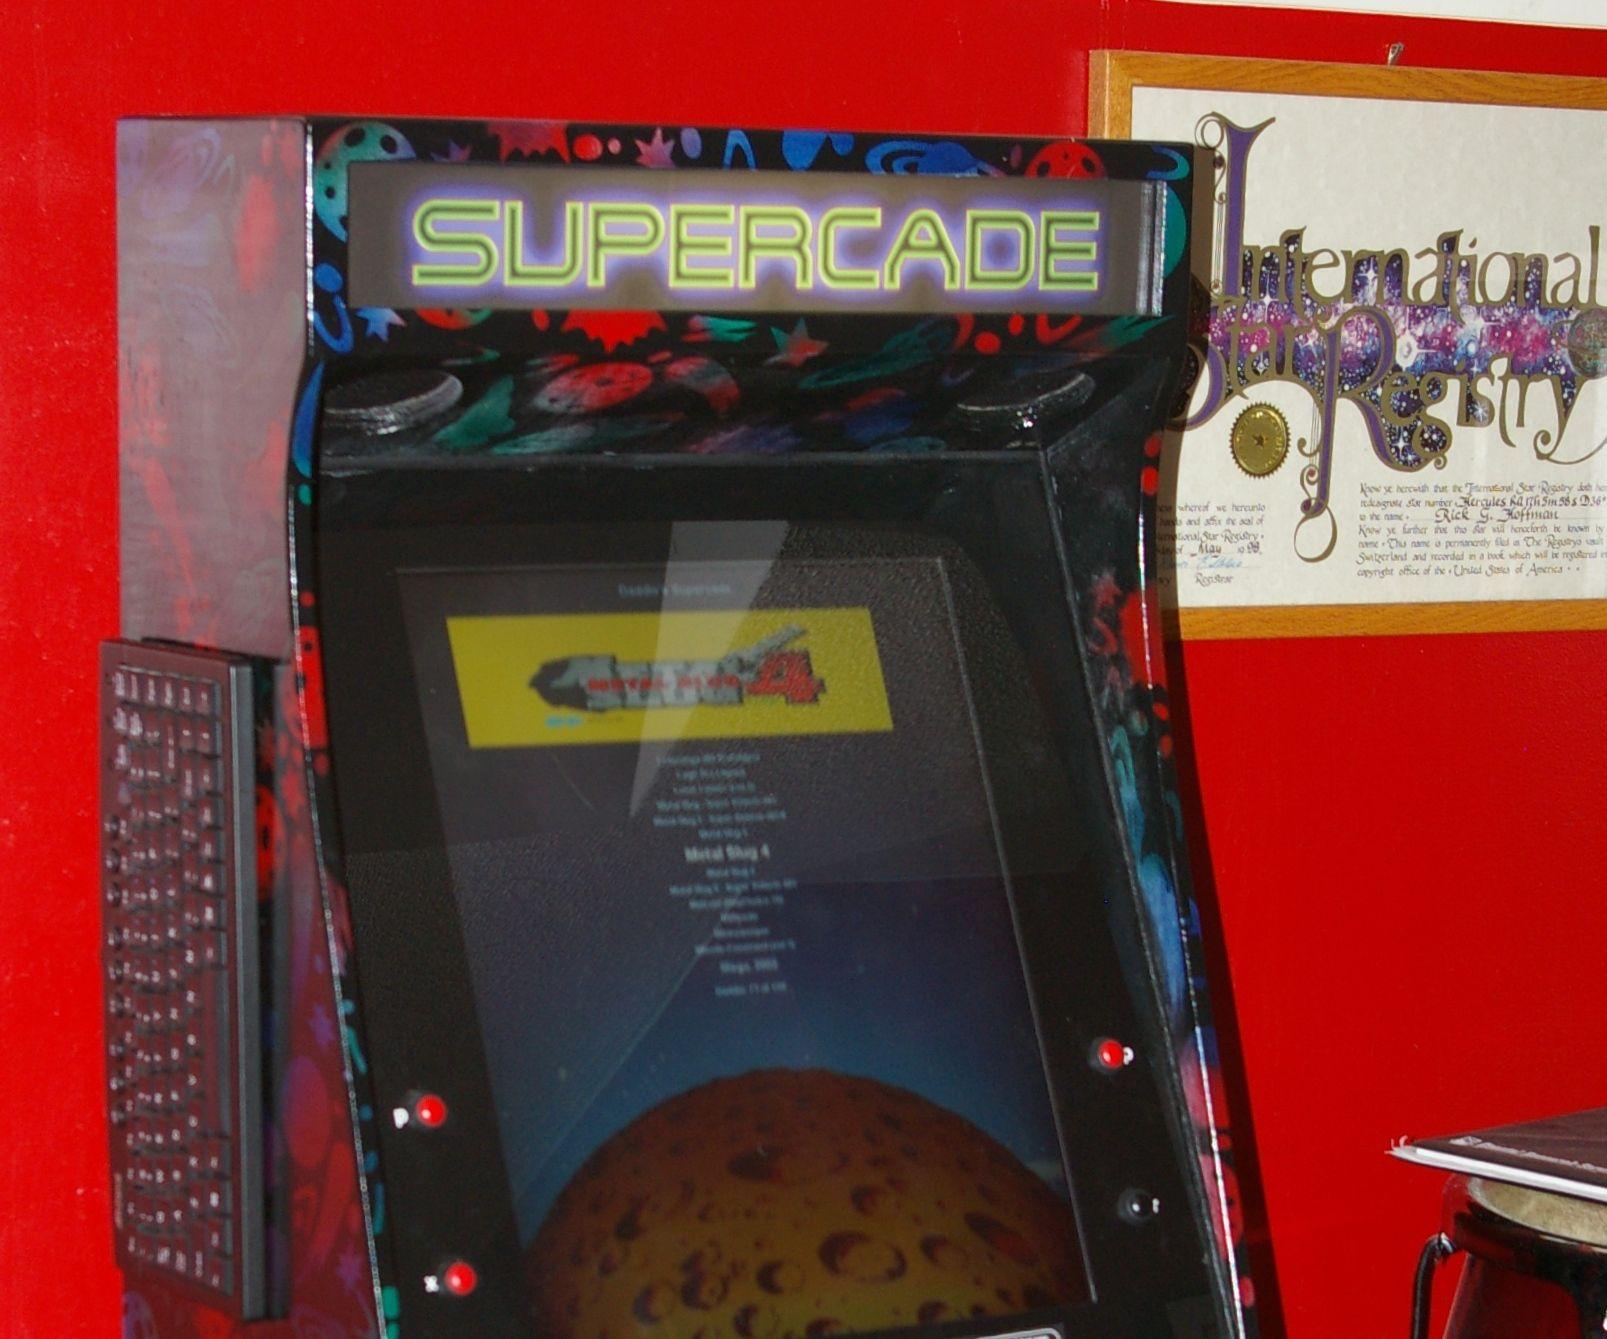 Supercade - How to Design and Build a Bar Top MAME Arcade